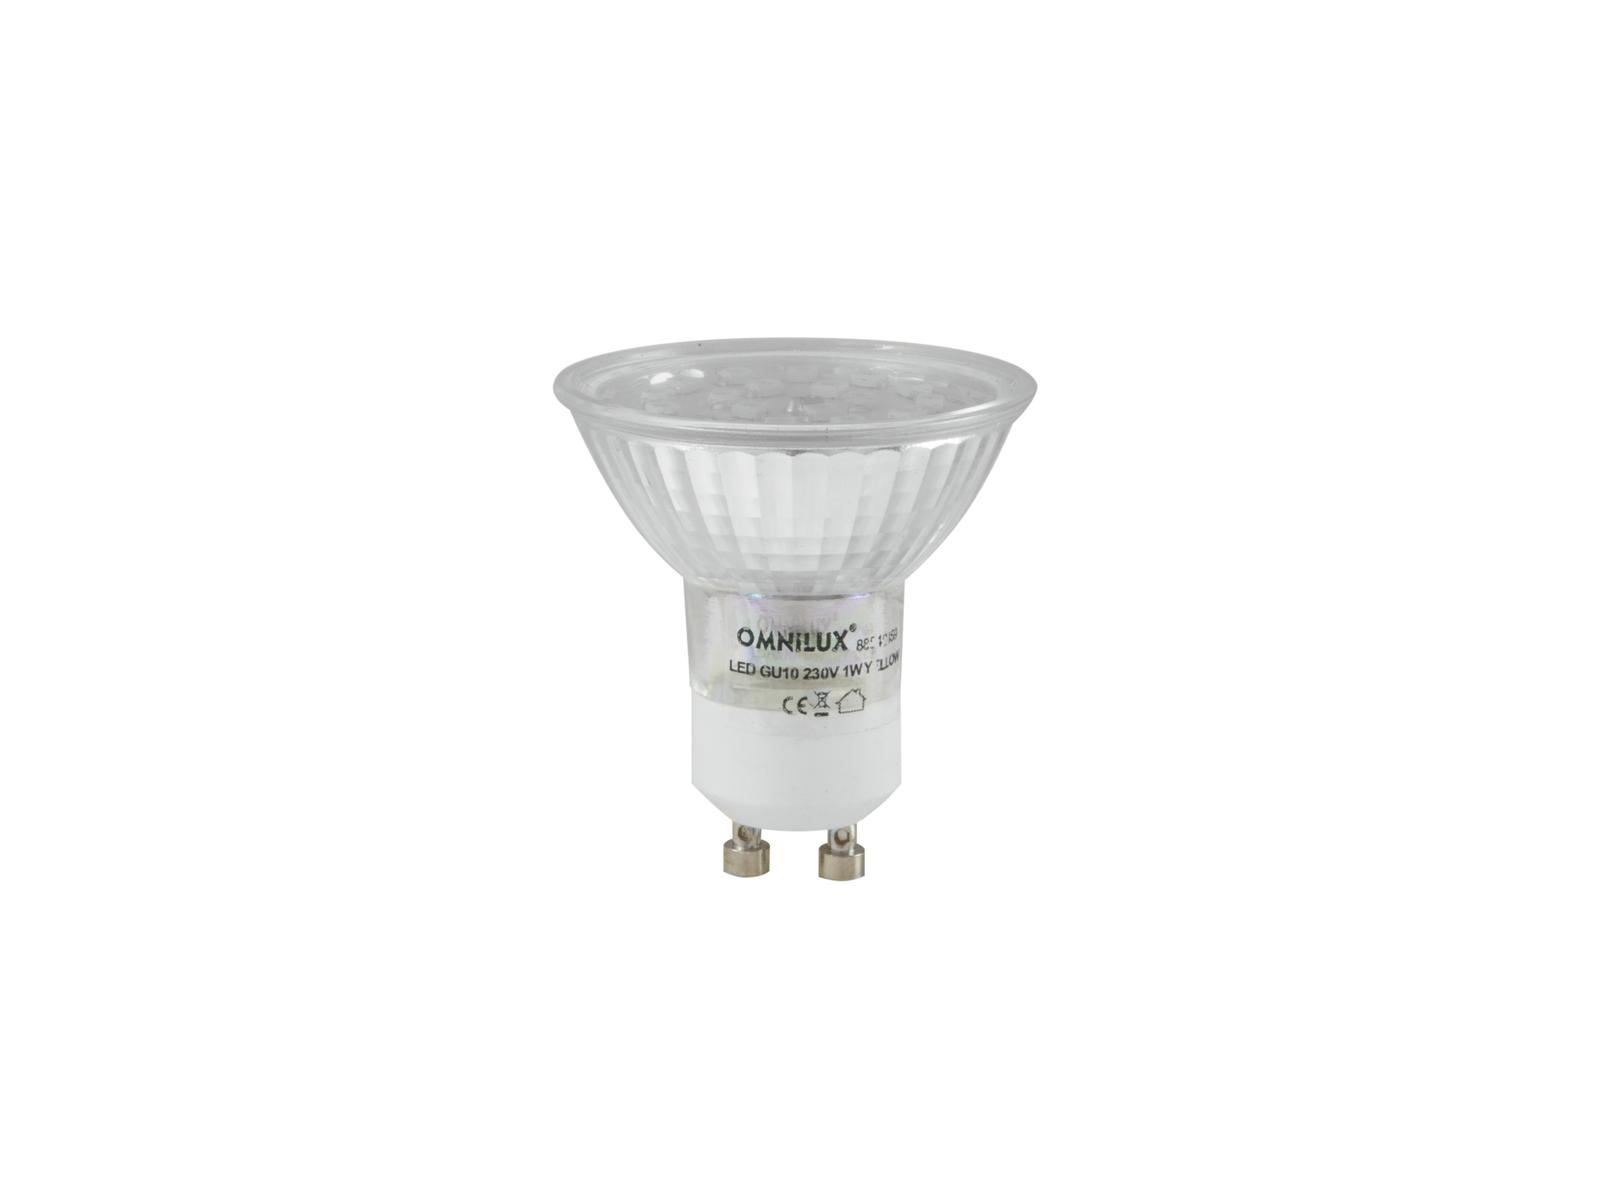 Lampada a led gialla GU-10 230